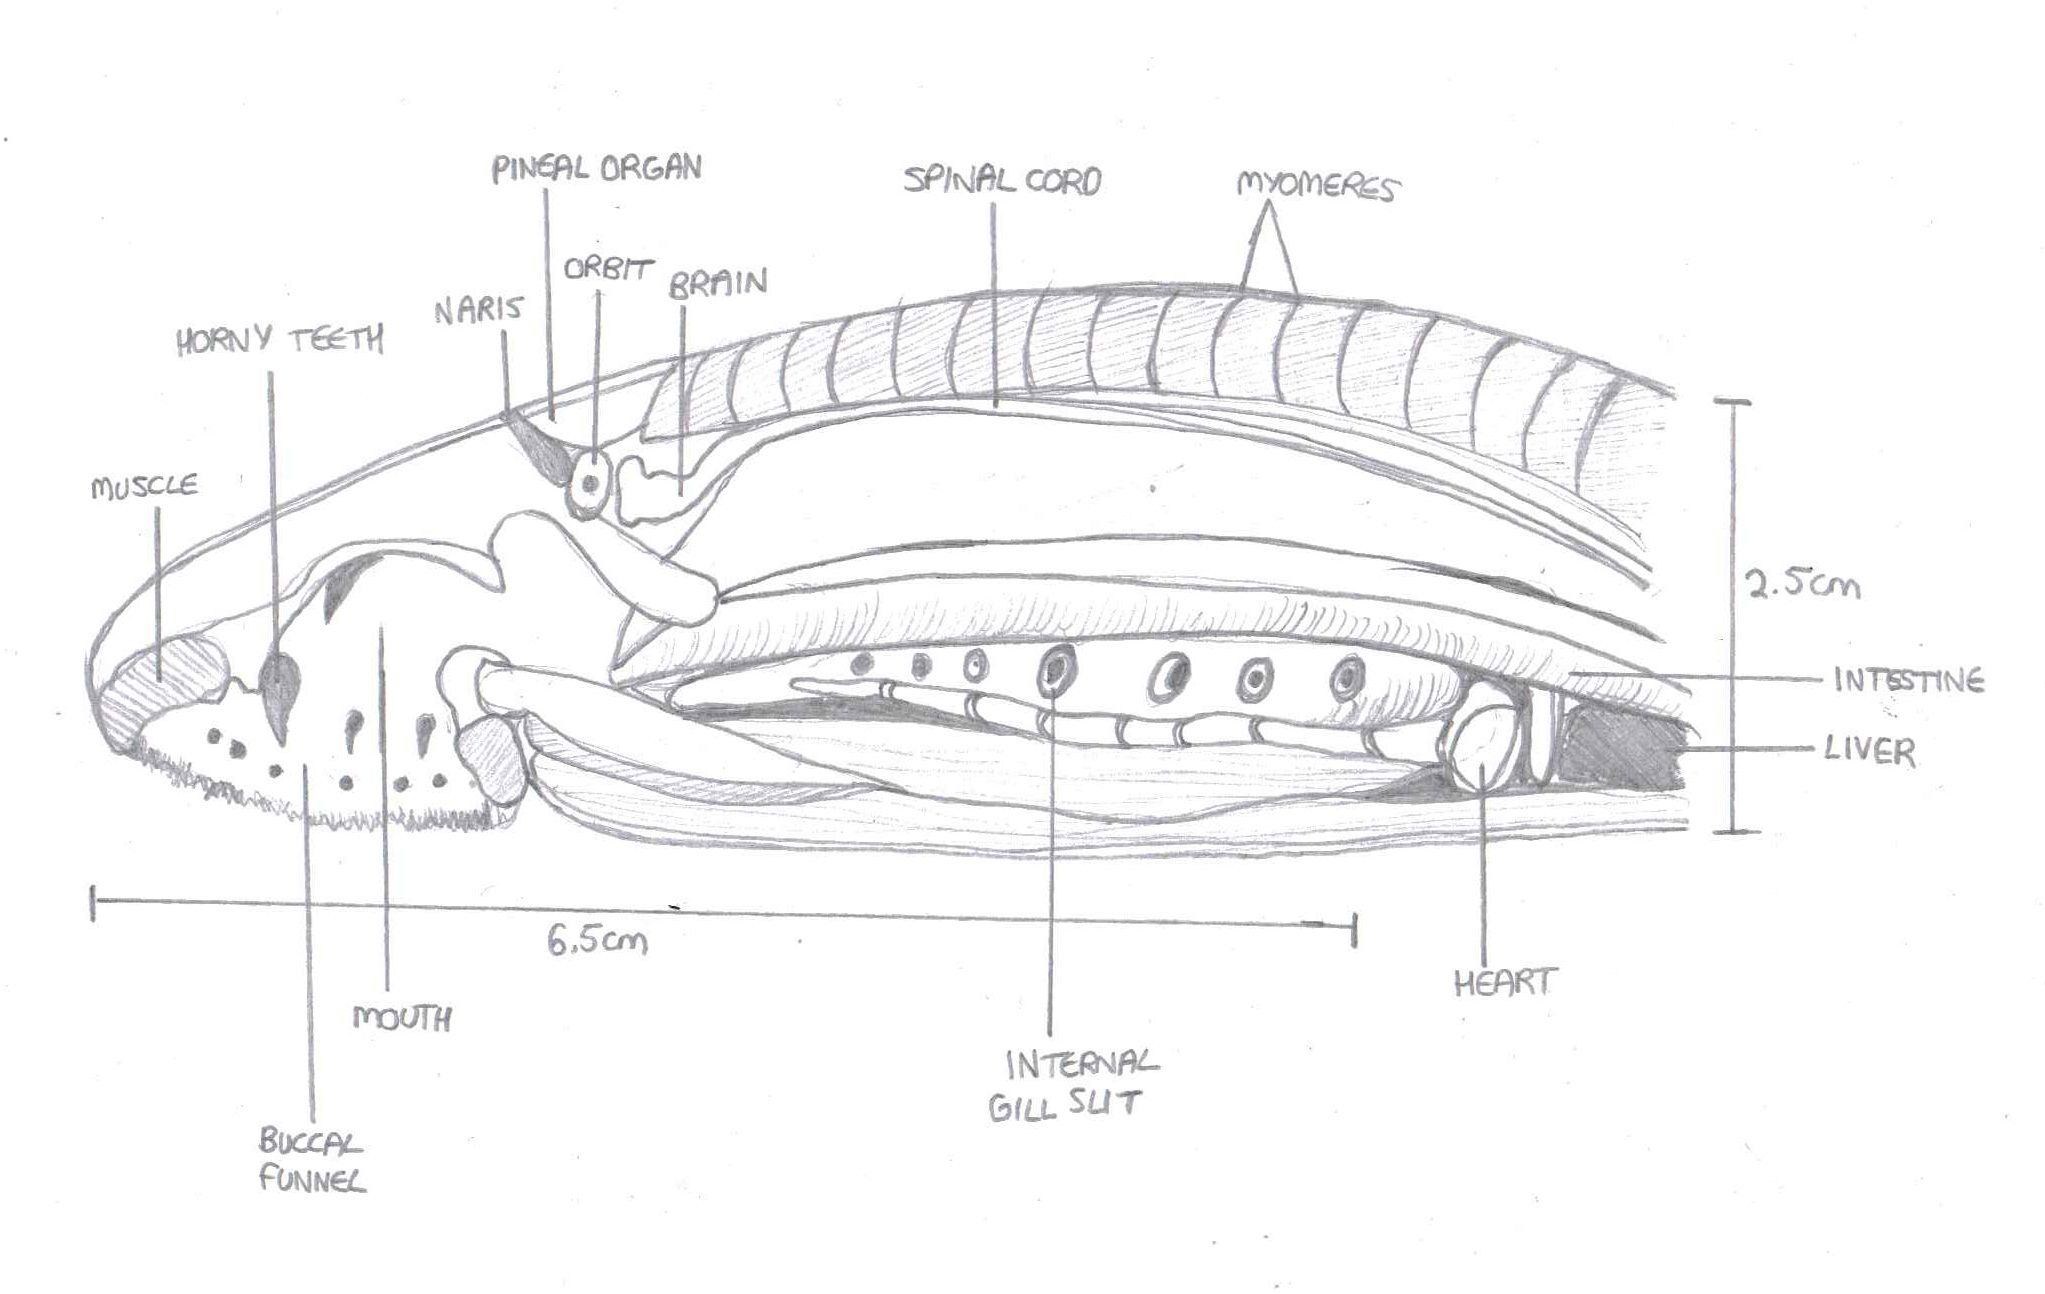 musculature anatomical diagram